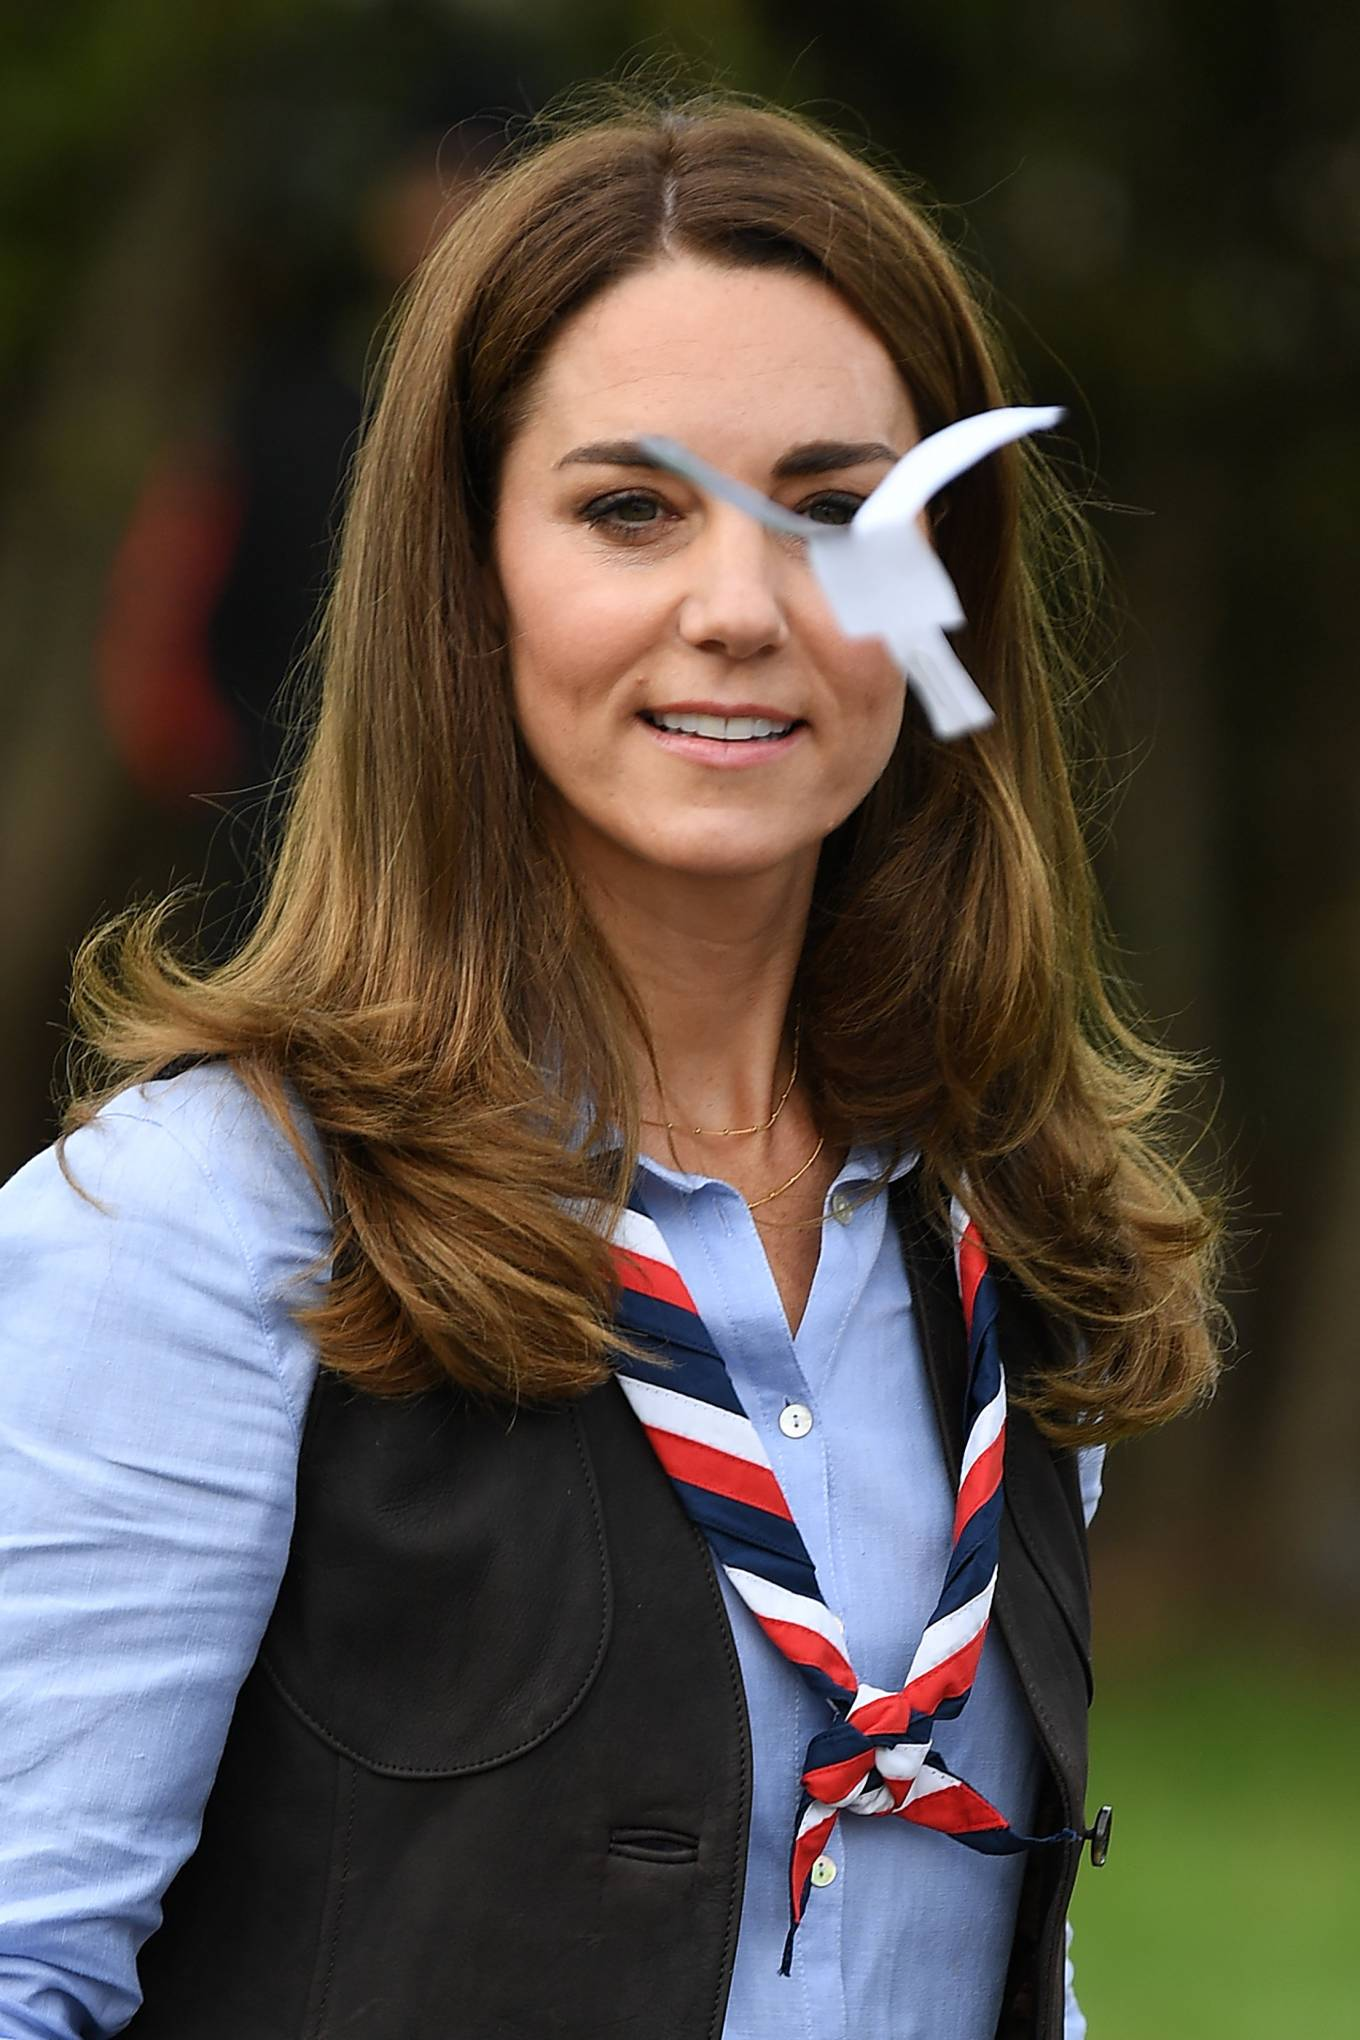 Kate Middleton - Visits a Scout Group in Northolt - Northwest London